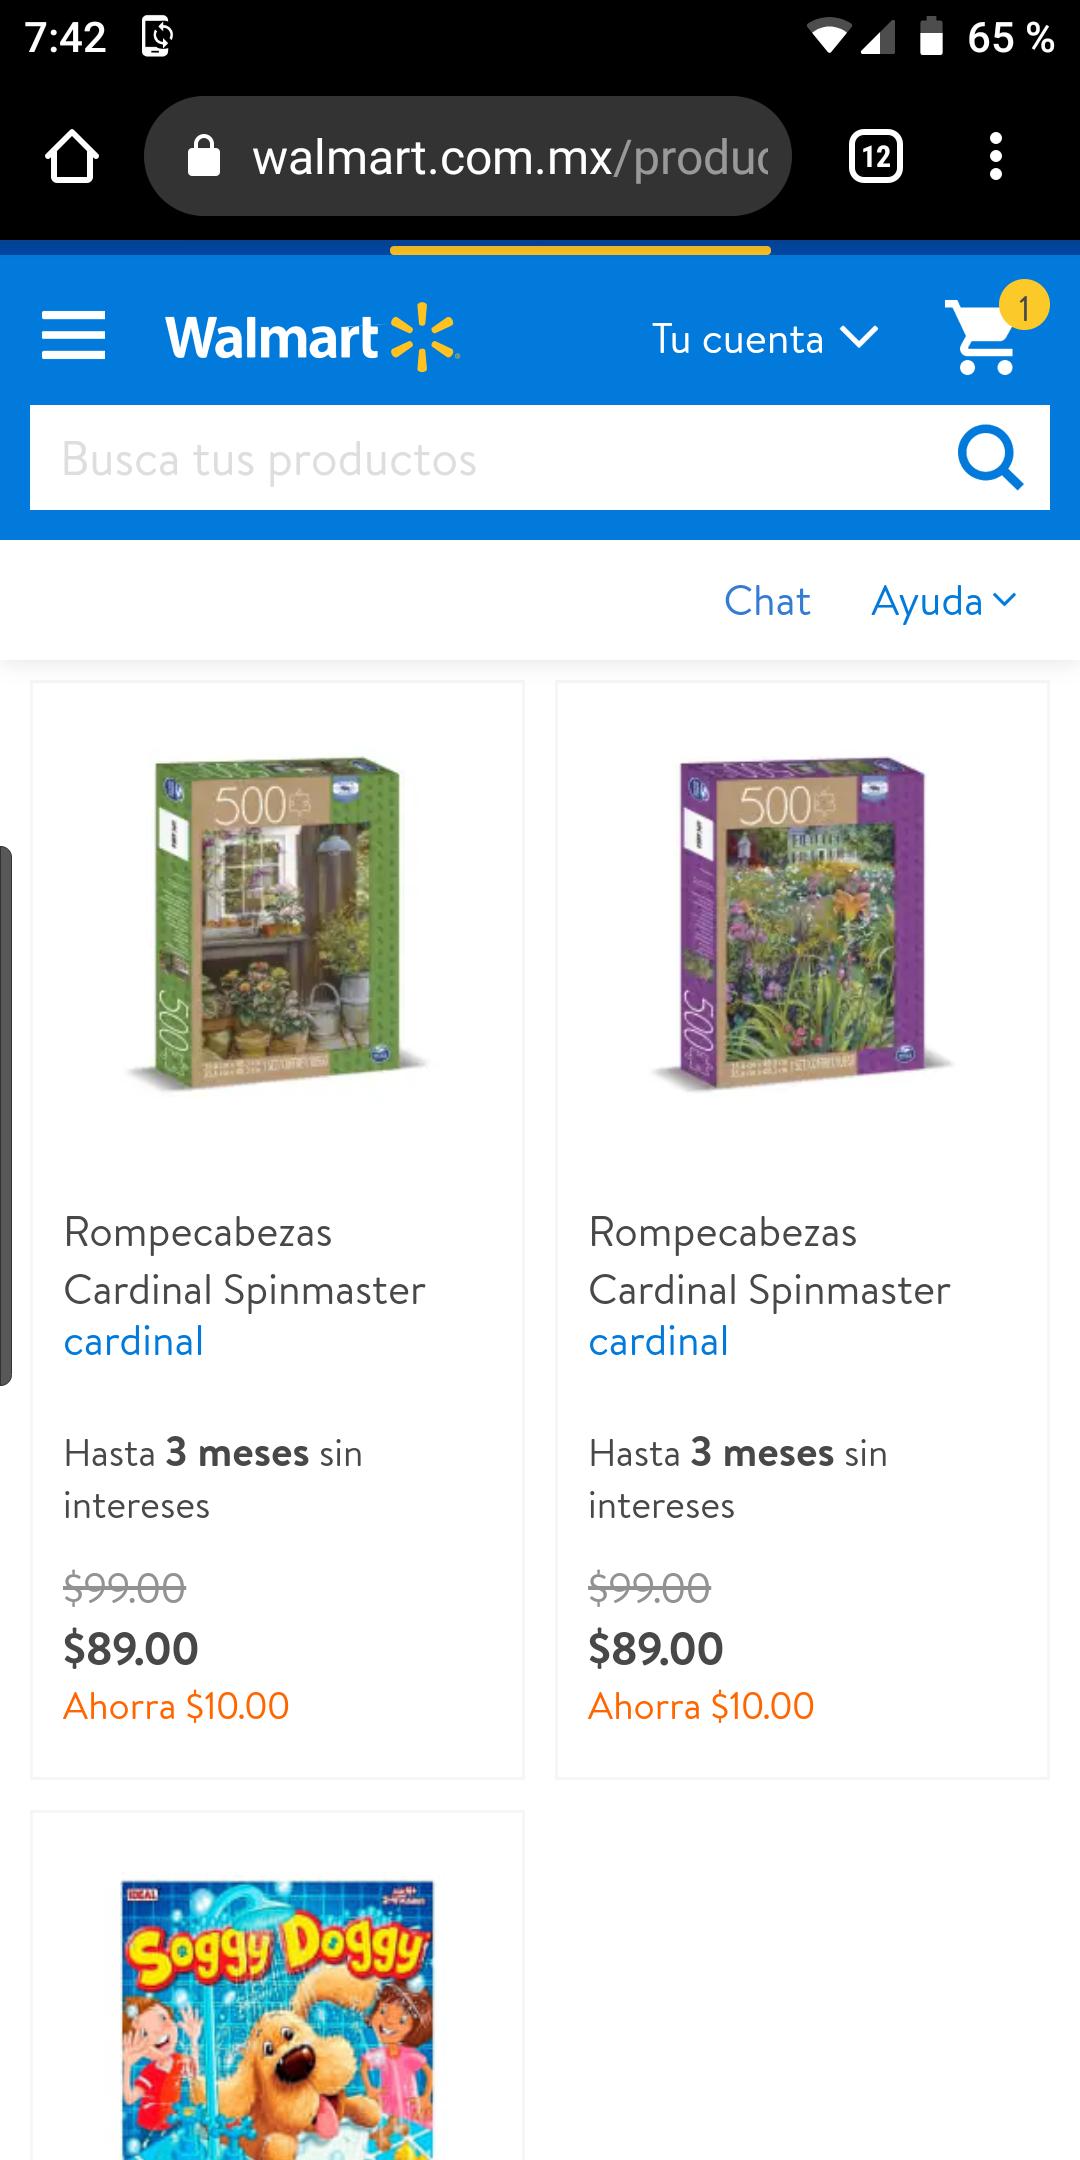 Walmart, Rompecabezas ventana ó flores 500 piezas spinmaster